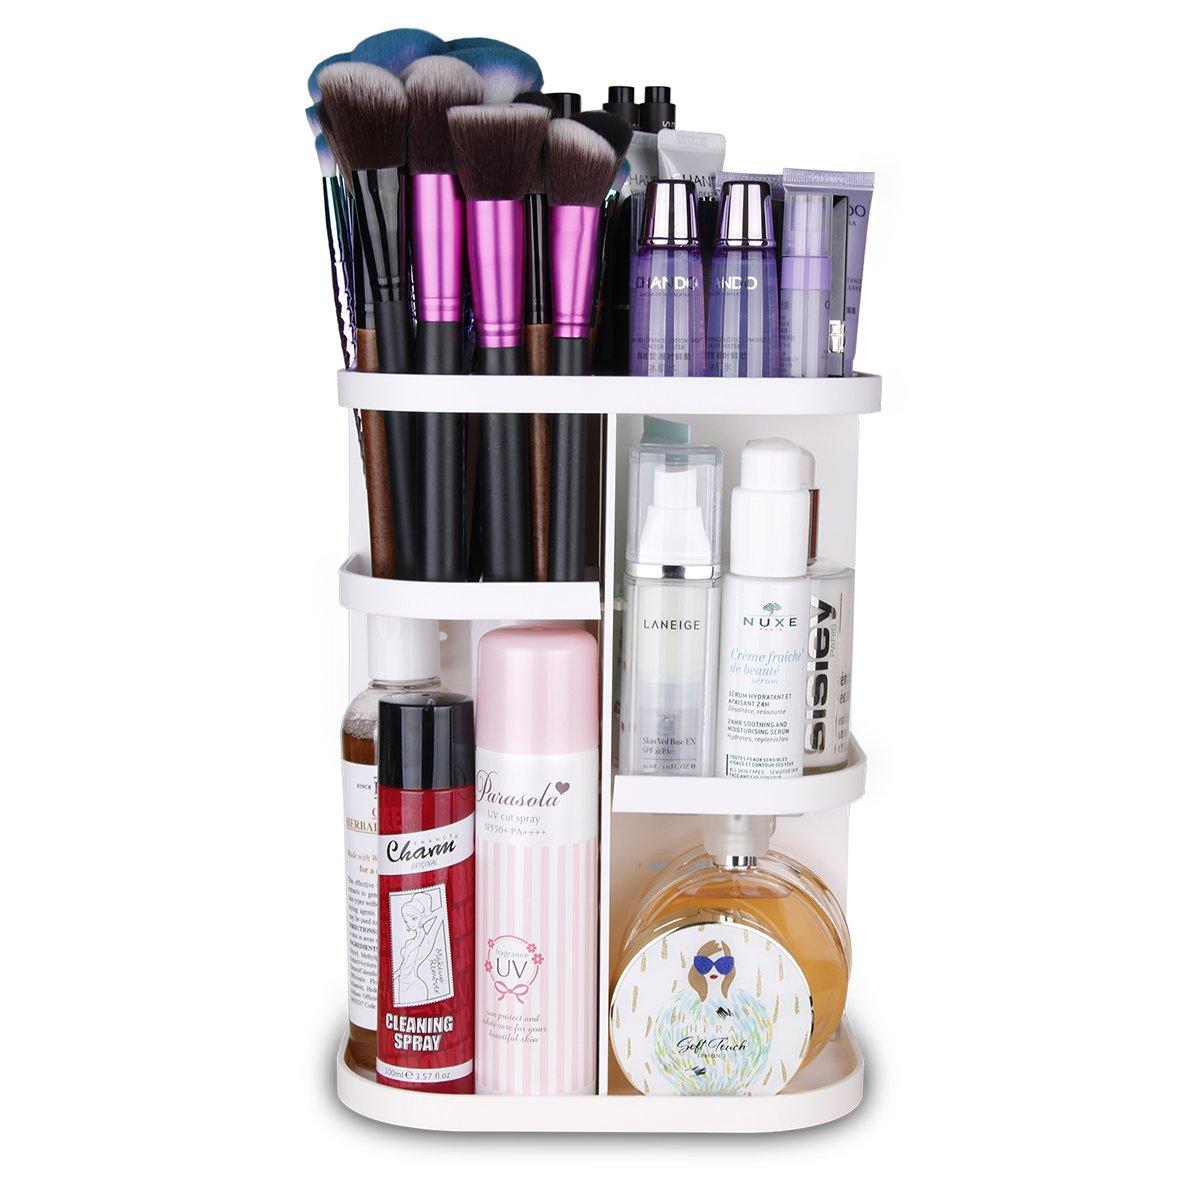 Playmont 2018 360 Degree Rotating Storage Box Adjustable Cosmetic Organizer Case Large Capacity Makeup Brushes Toner Creams Lipsticks More, Small, White